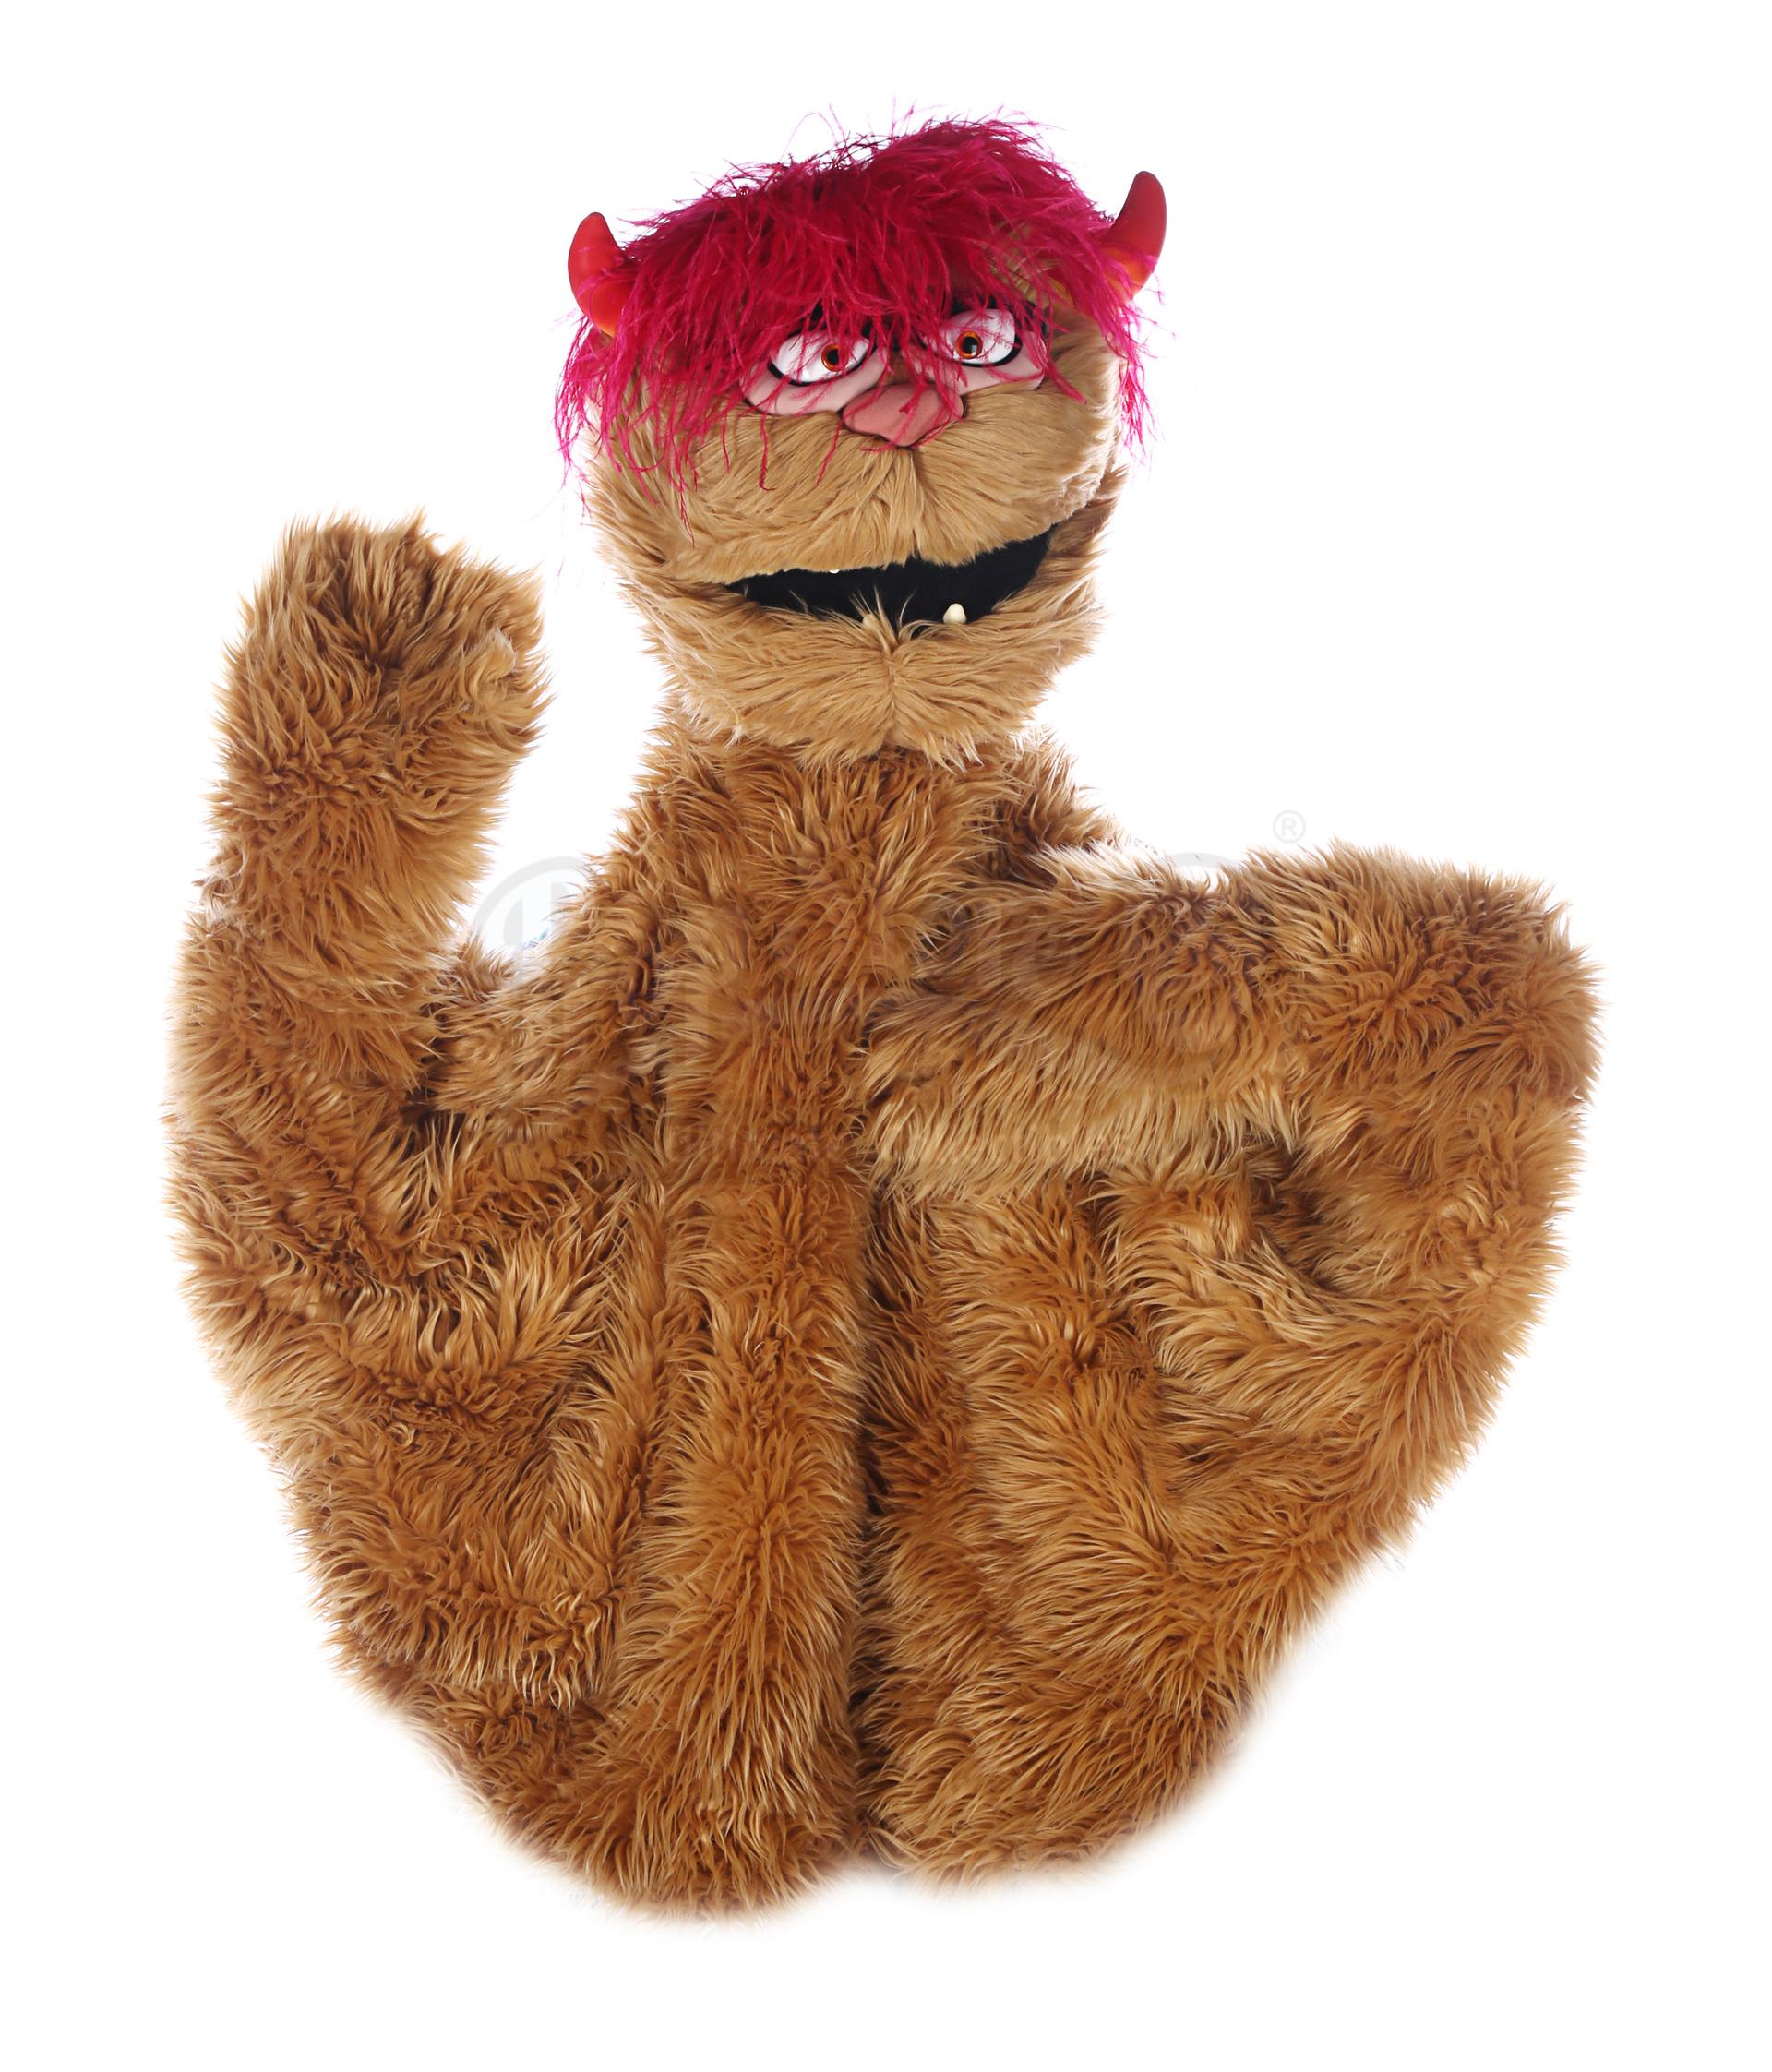 AVENUE Q (STAGE SHOW) - Trekkie Monster Puppet - Image 2 of 5